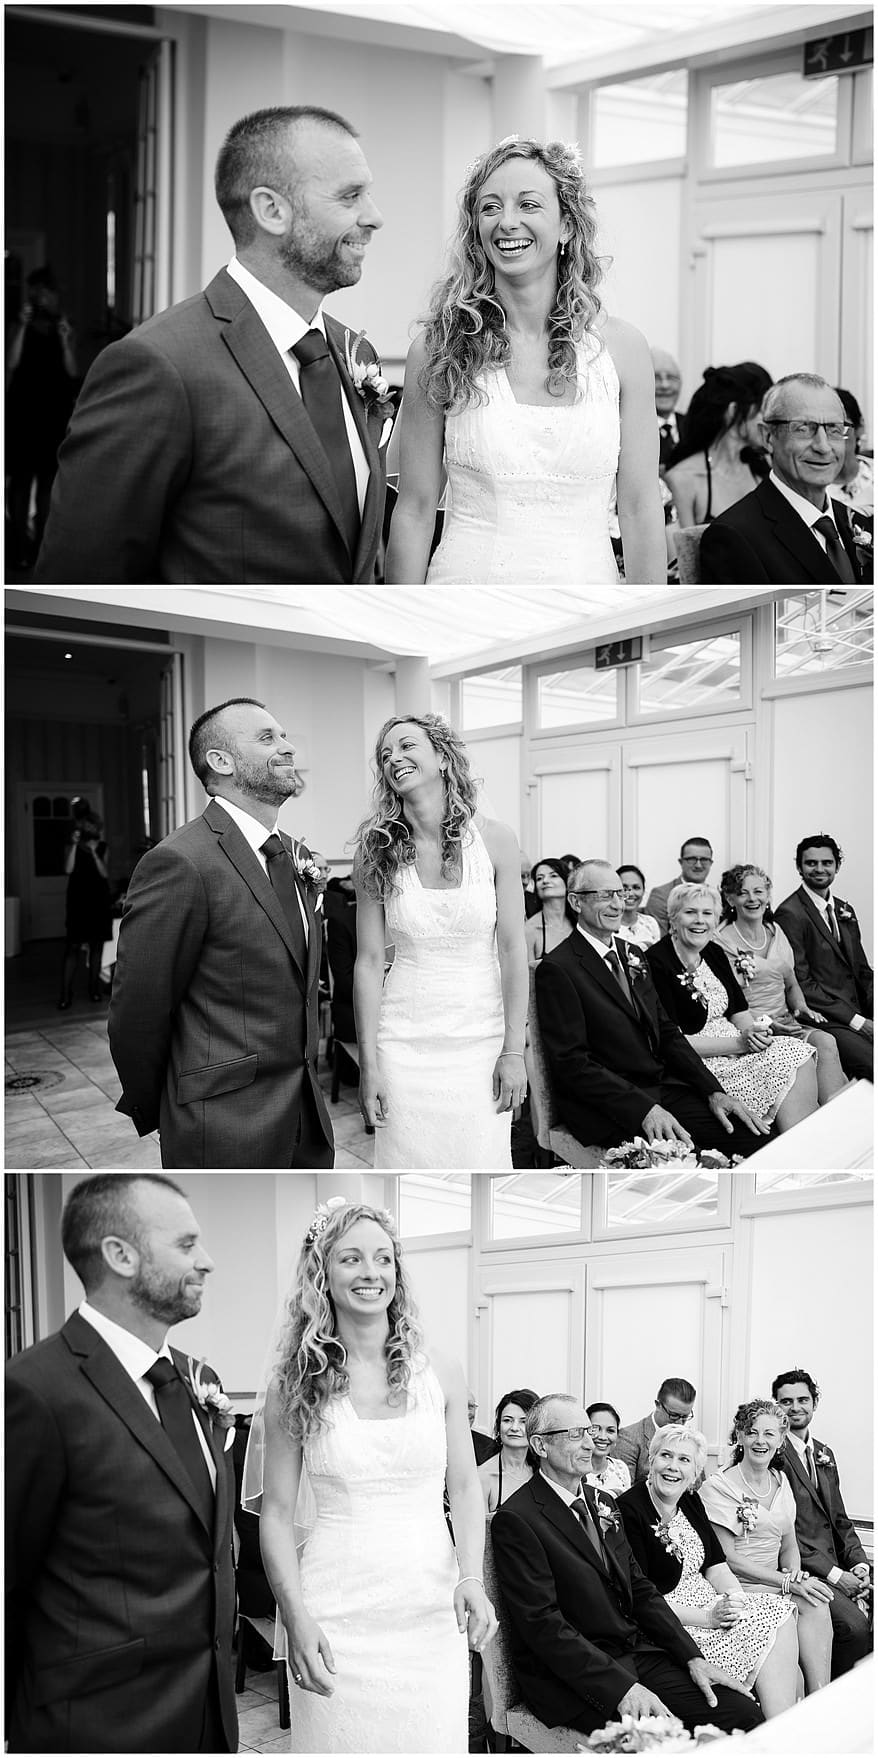 Carbis bay hotel wedding ceremony